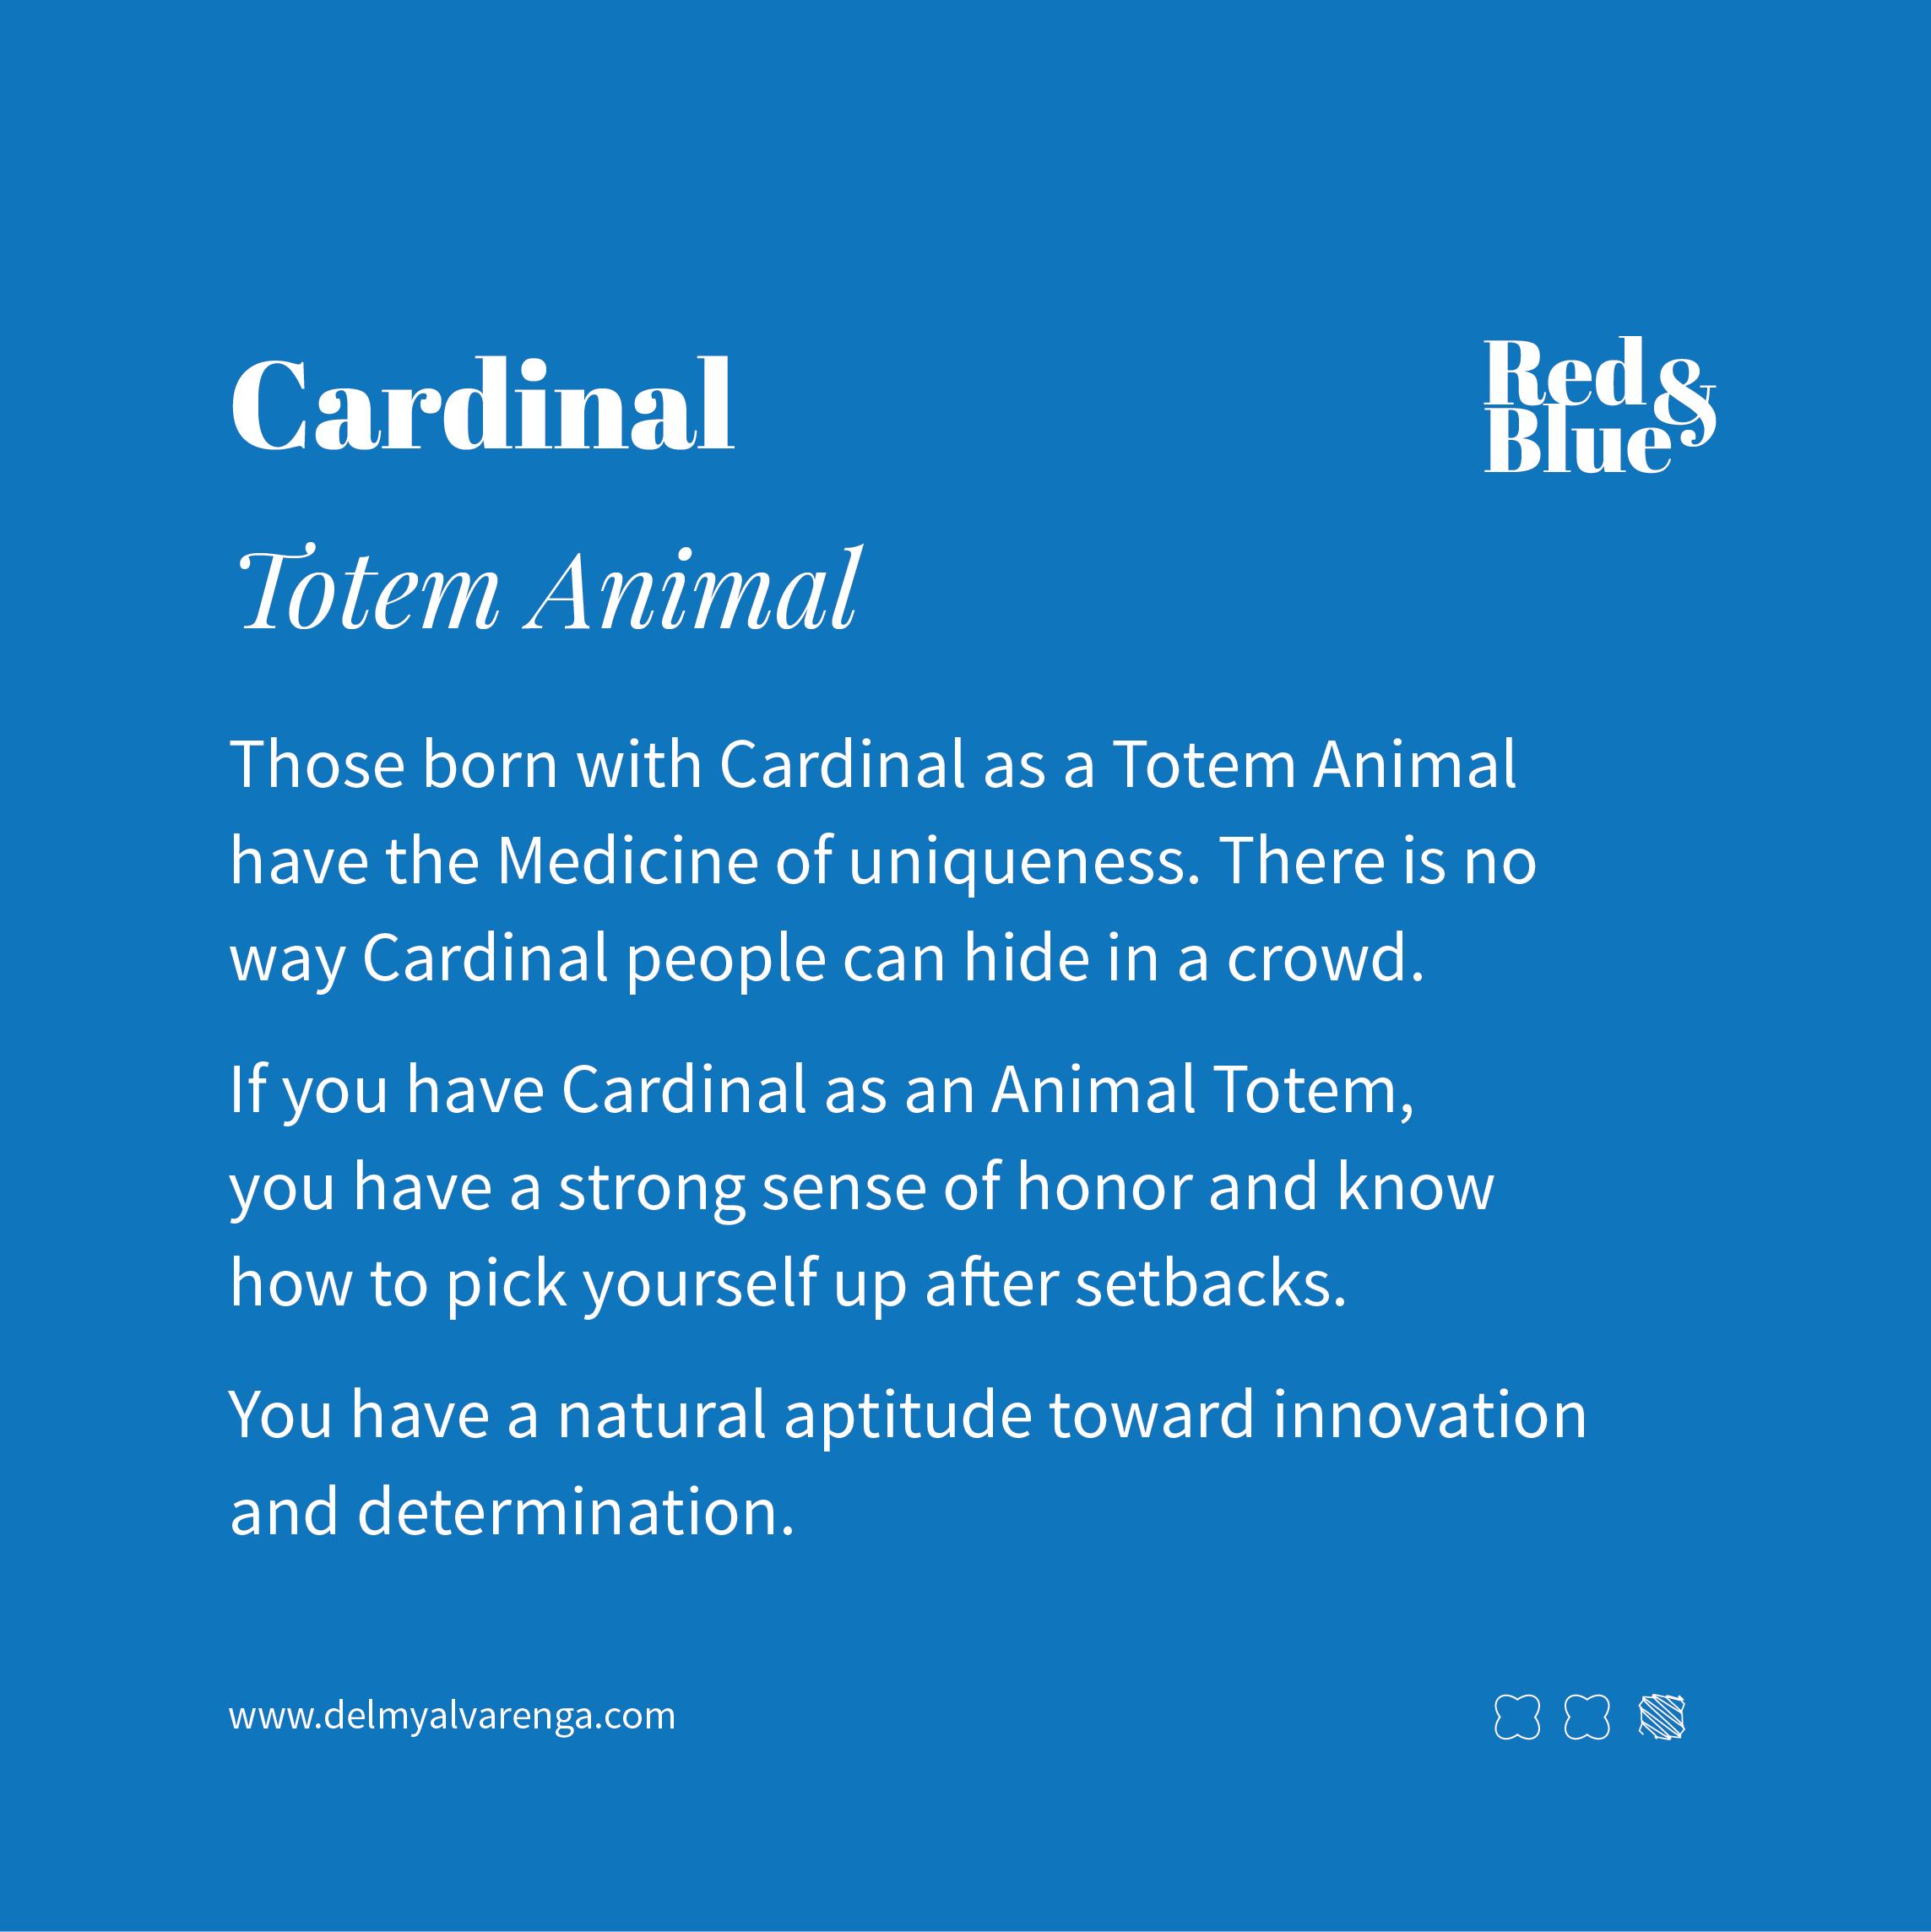 Cardinal Totem Animal